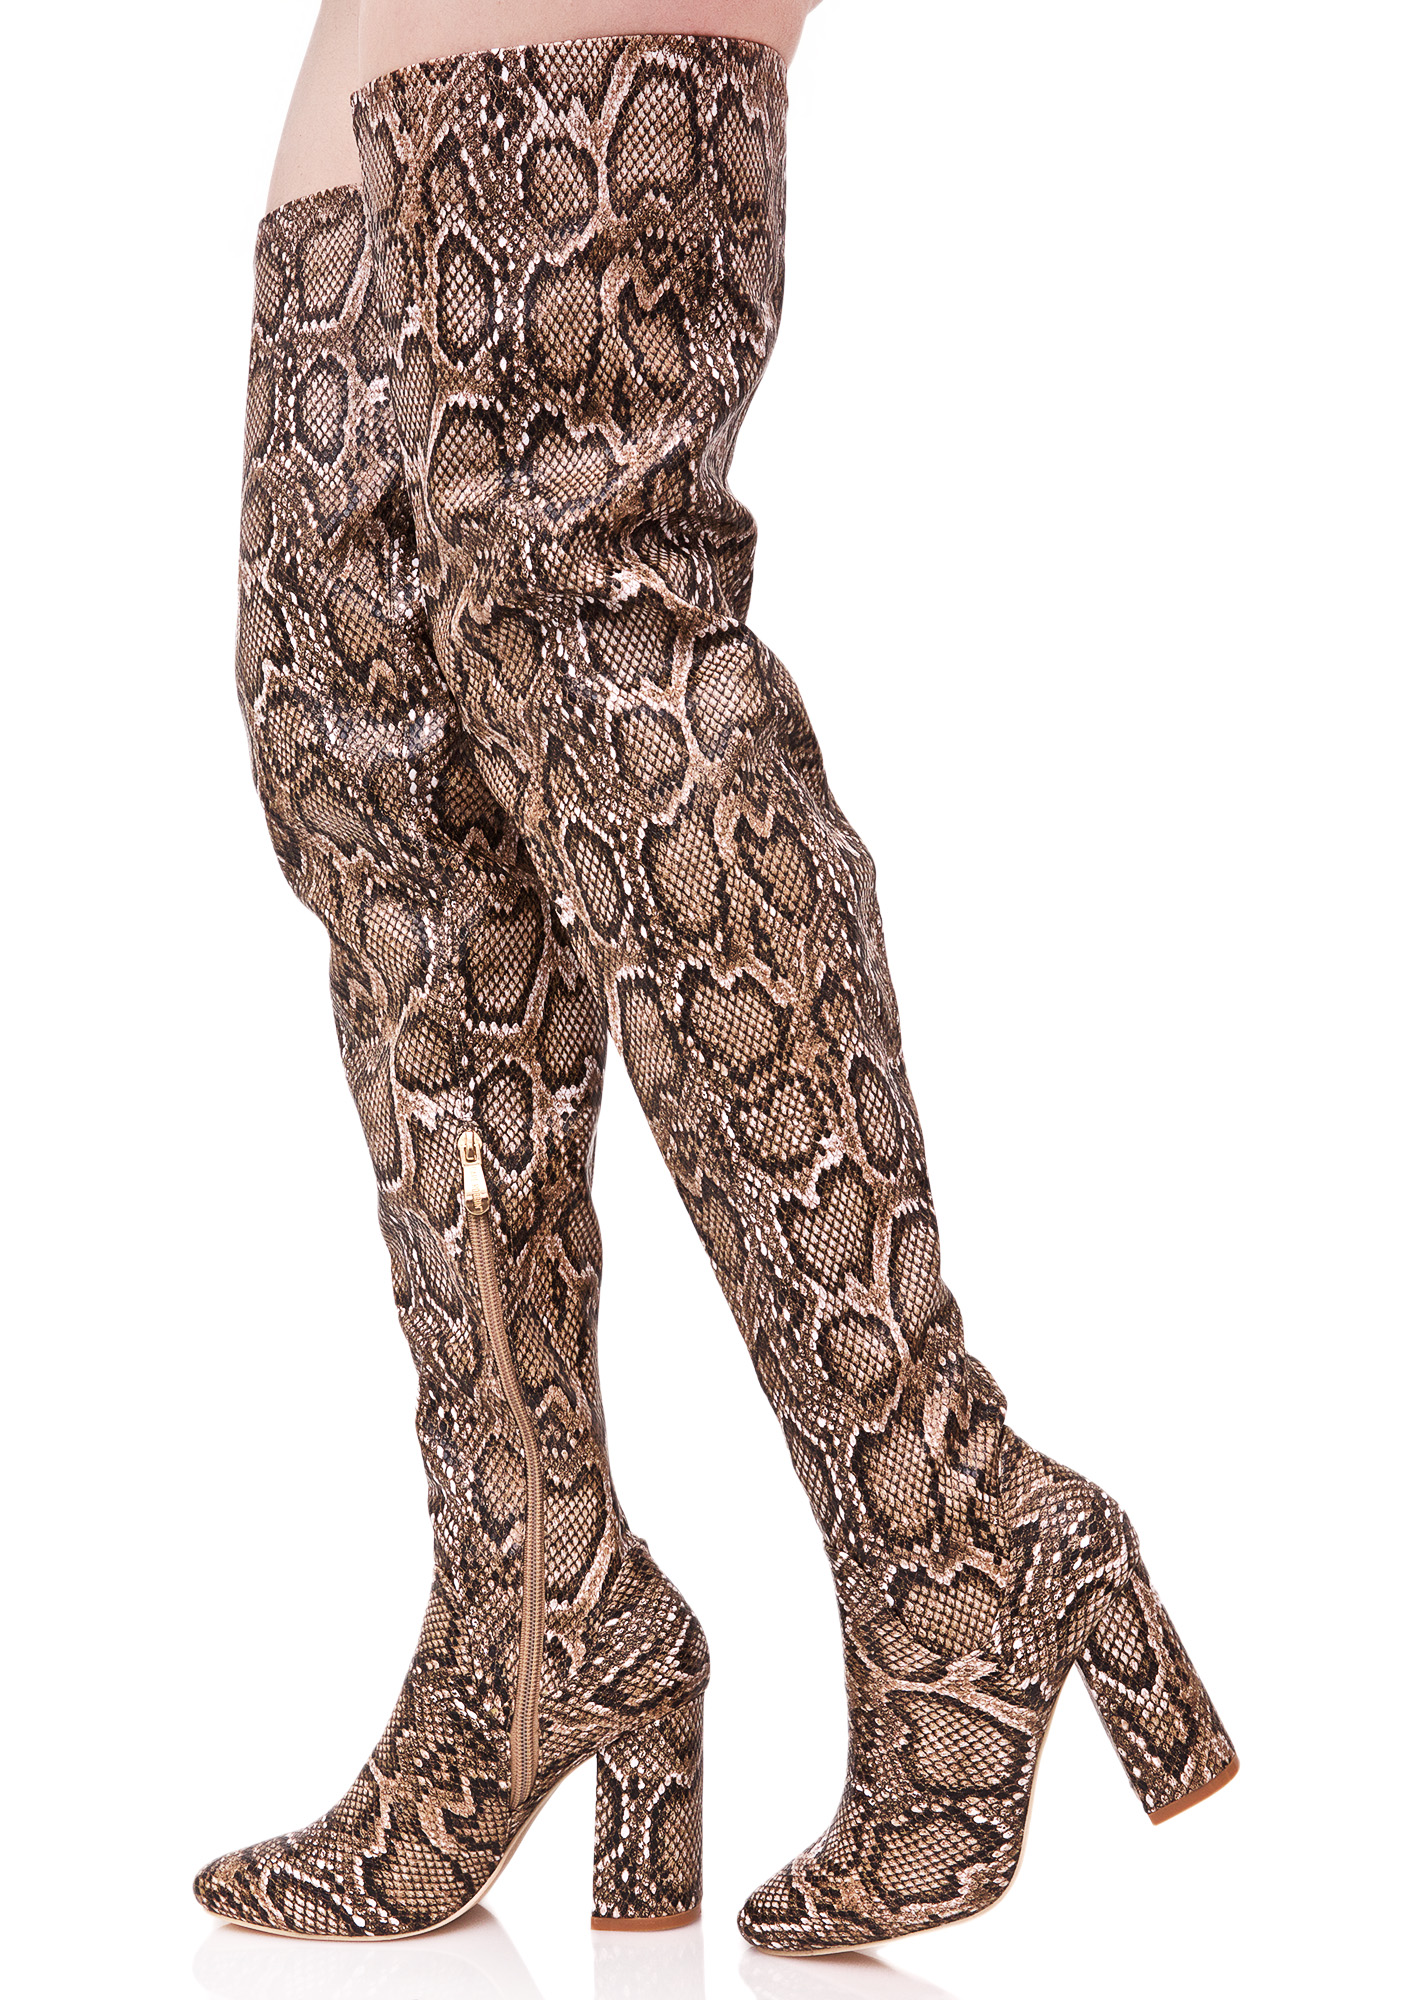 Brown Snakeskin Thigh High Boots